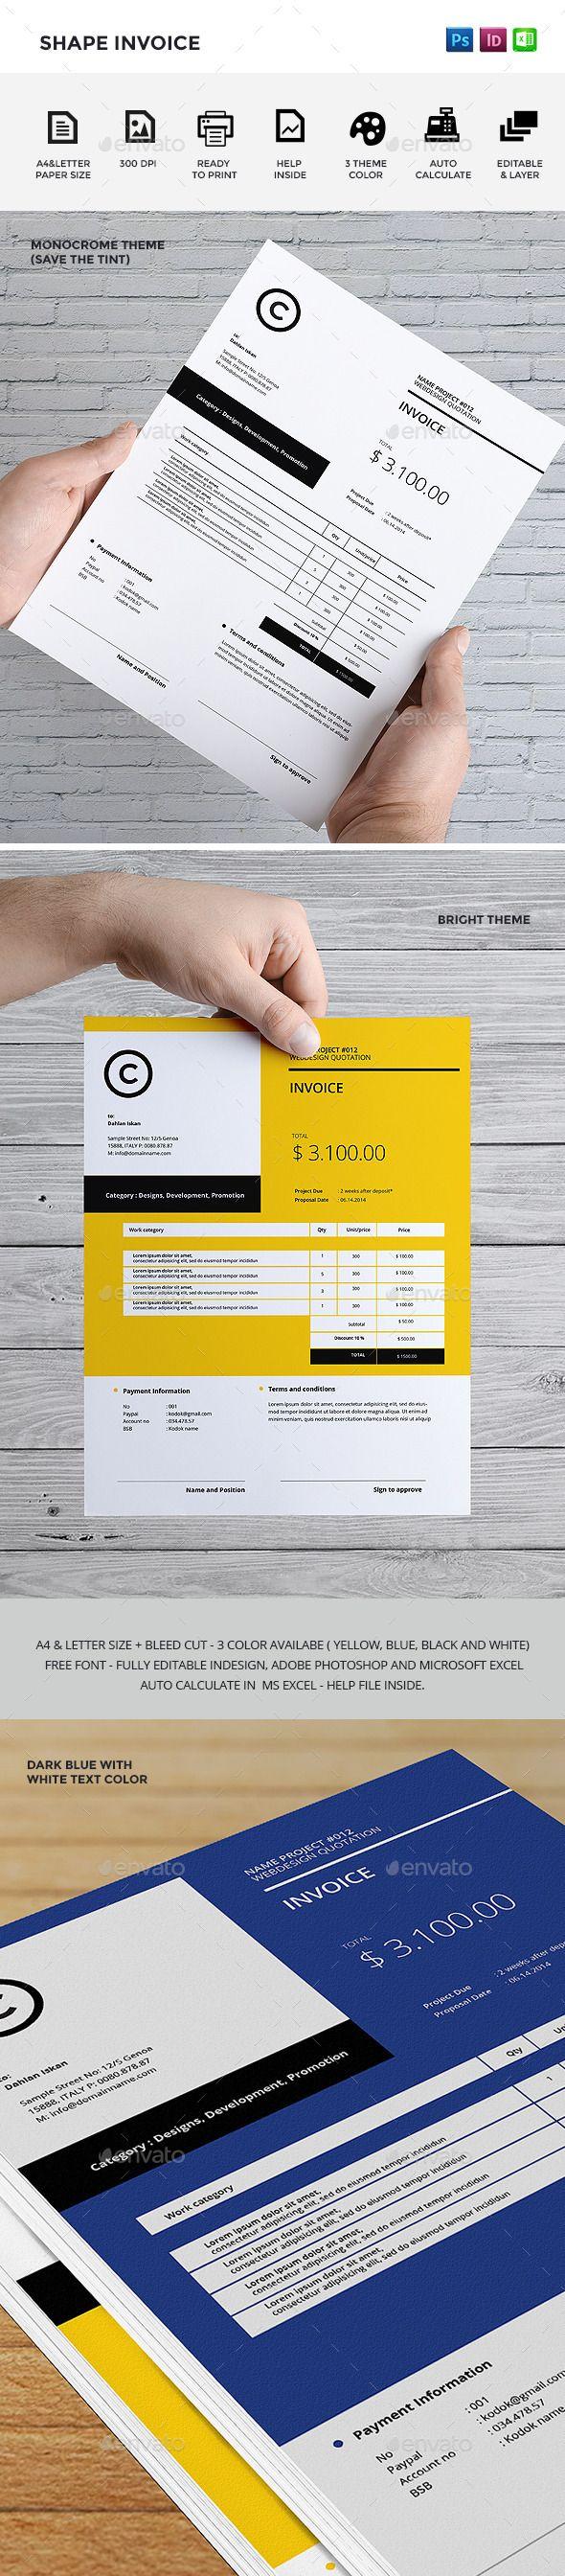 Shape Invoice Template   #invoice #invoicetemplate #invoicedesign   Download: http://graphicriver.net/item/shape-invoice/9308236?ref=ksioks